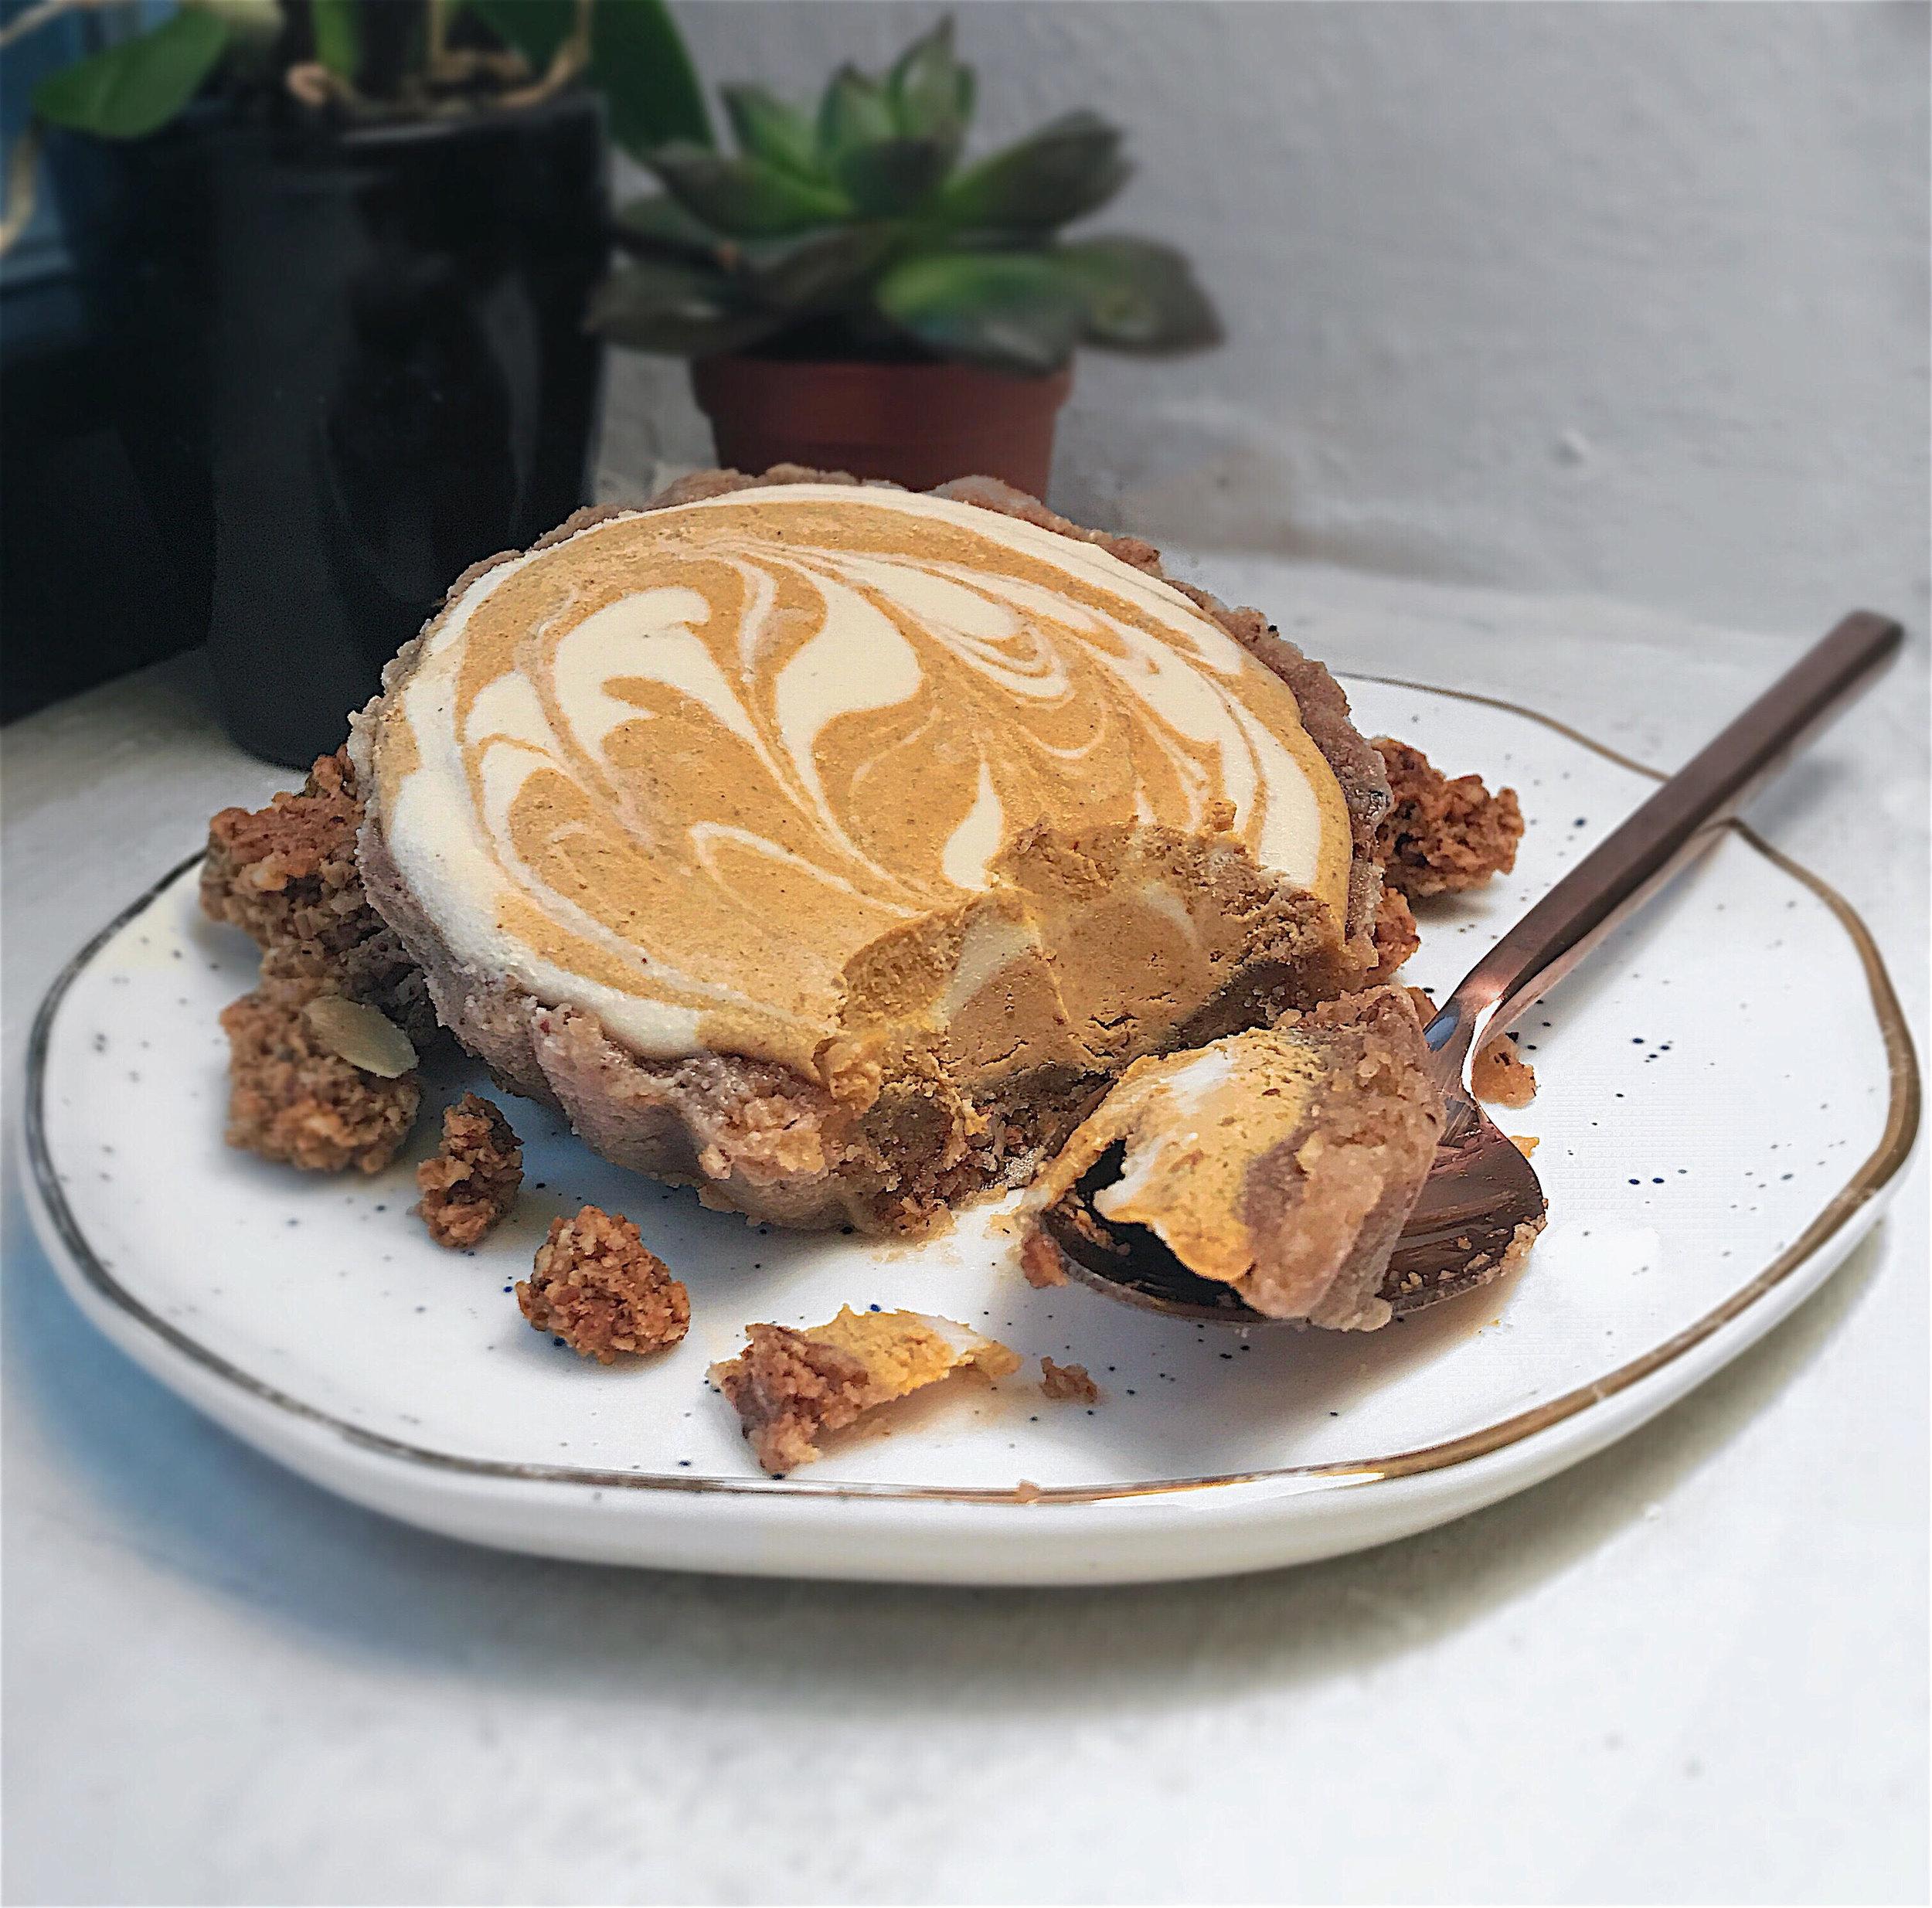 pumpkinswirl cheesecake.jpg